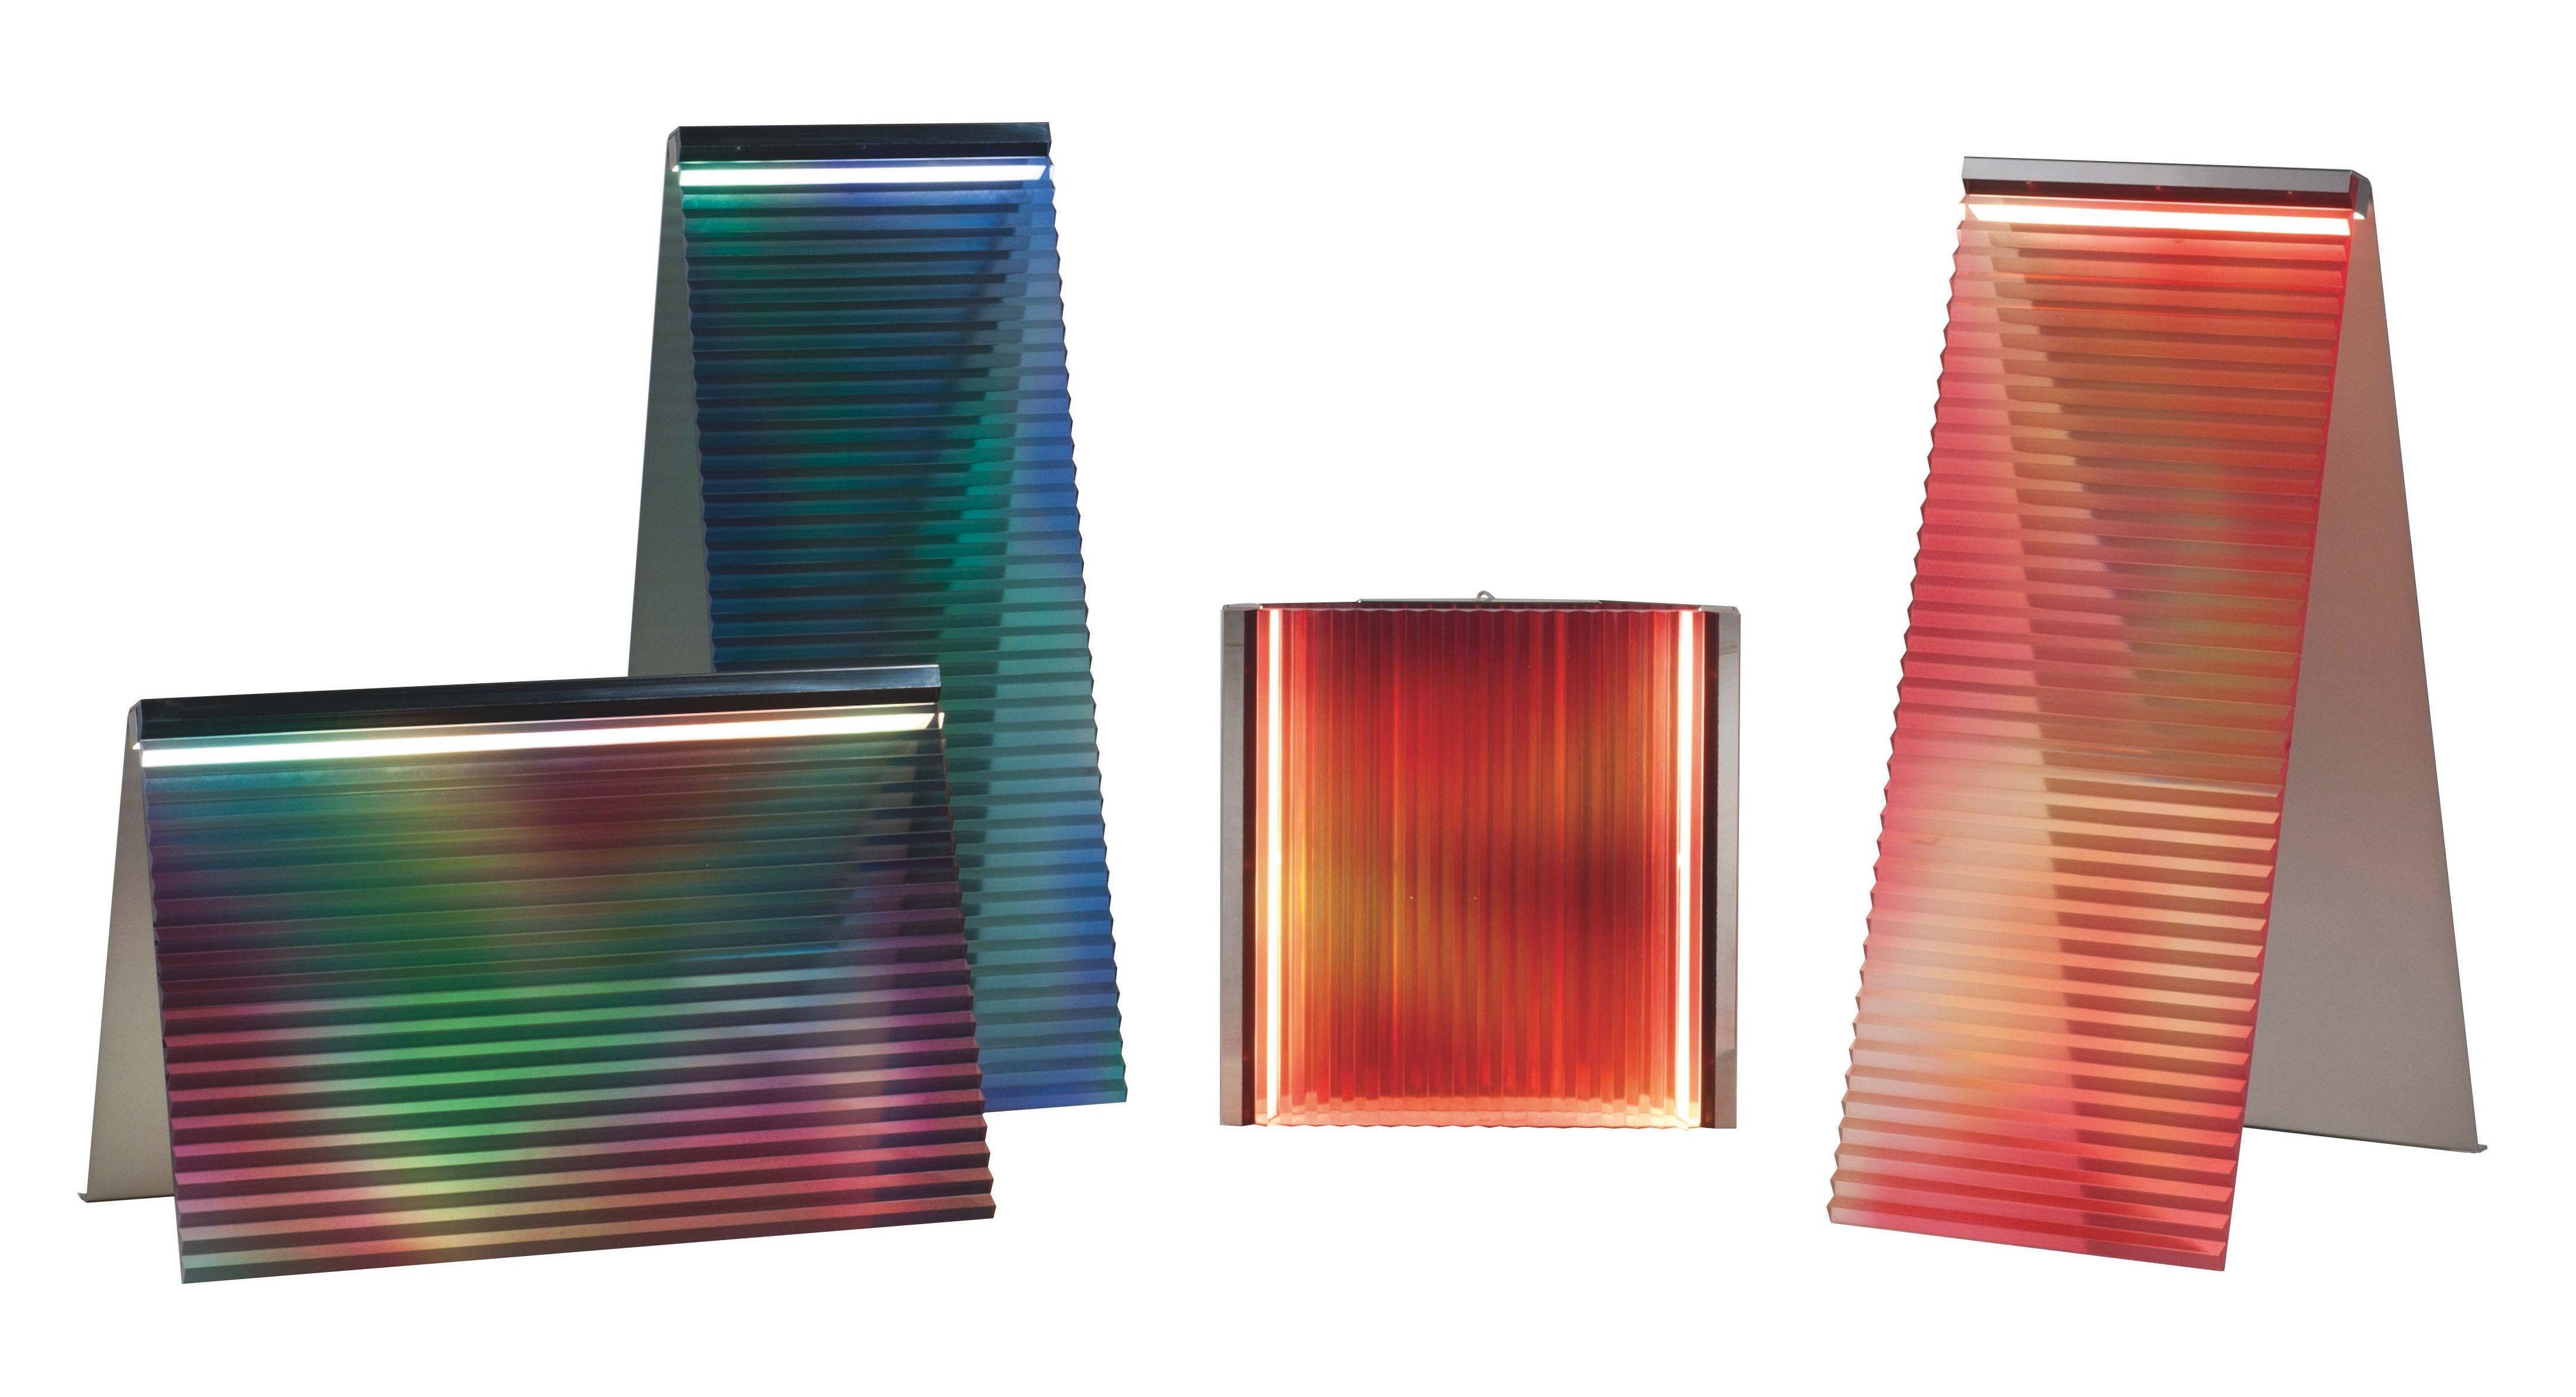 Lámparas de colorres de Roche Bobois